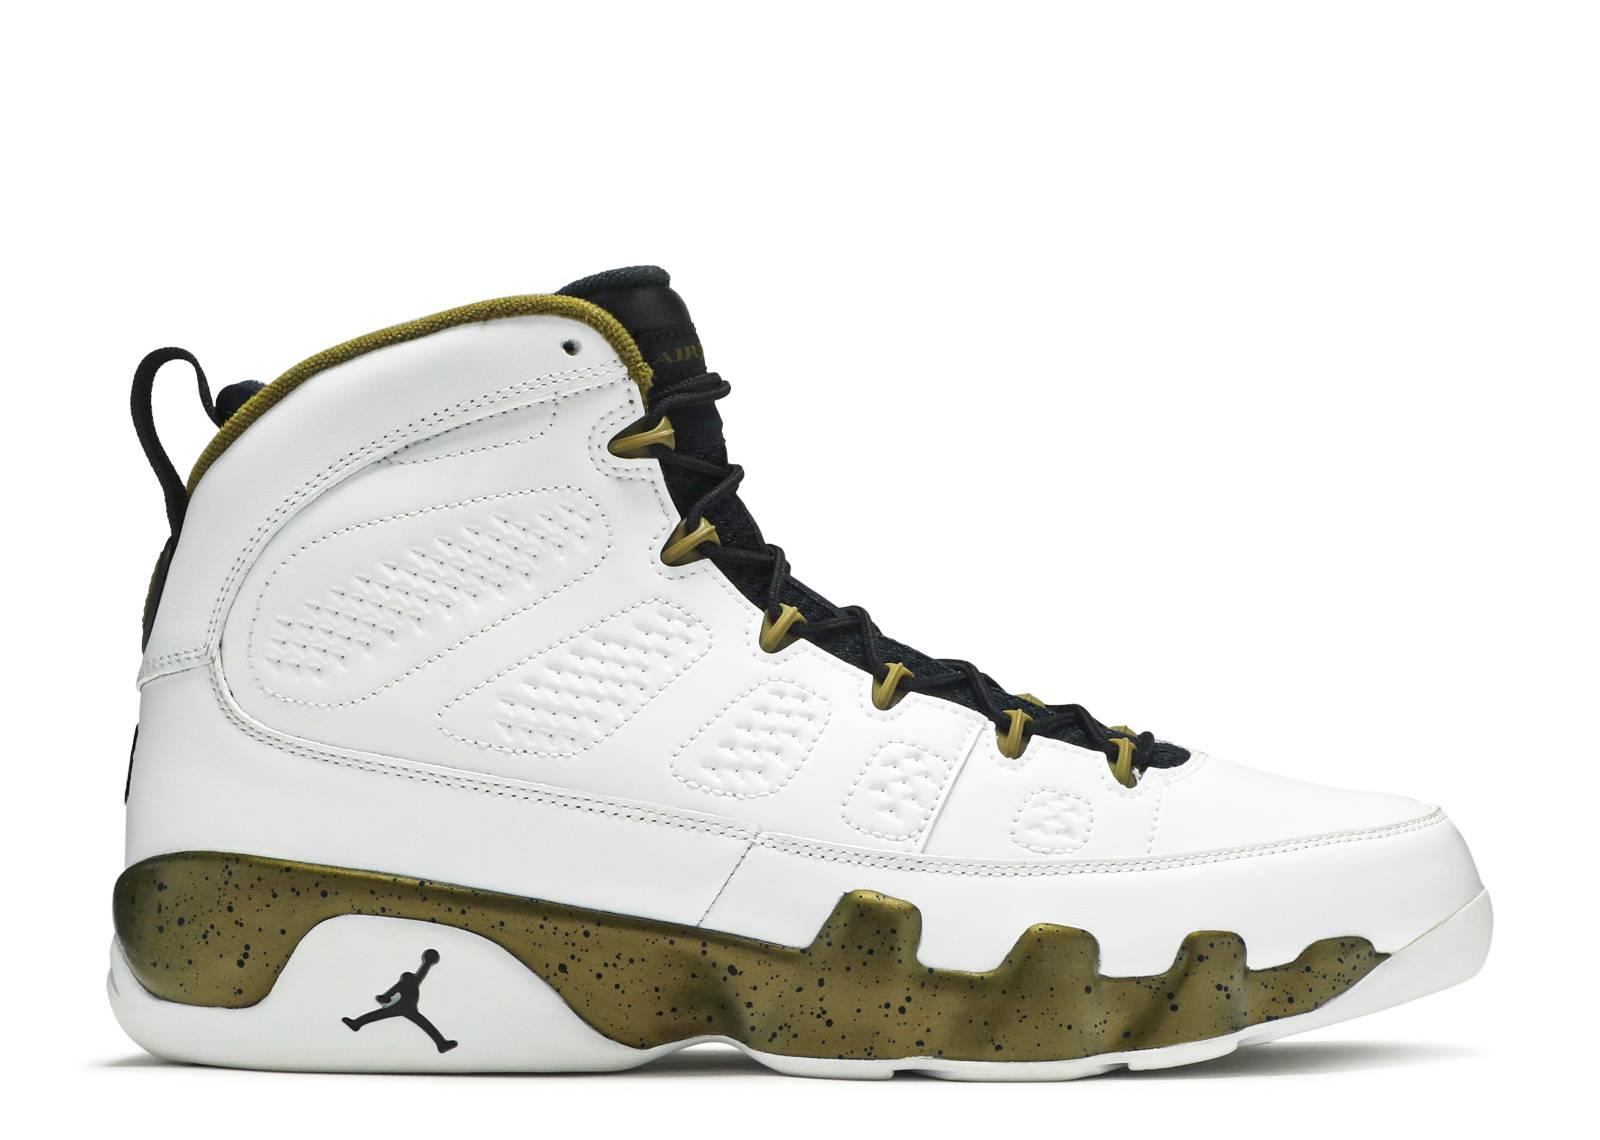 99afd0f50b8cef Air Jordan 9 Retro